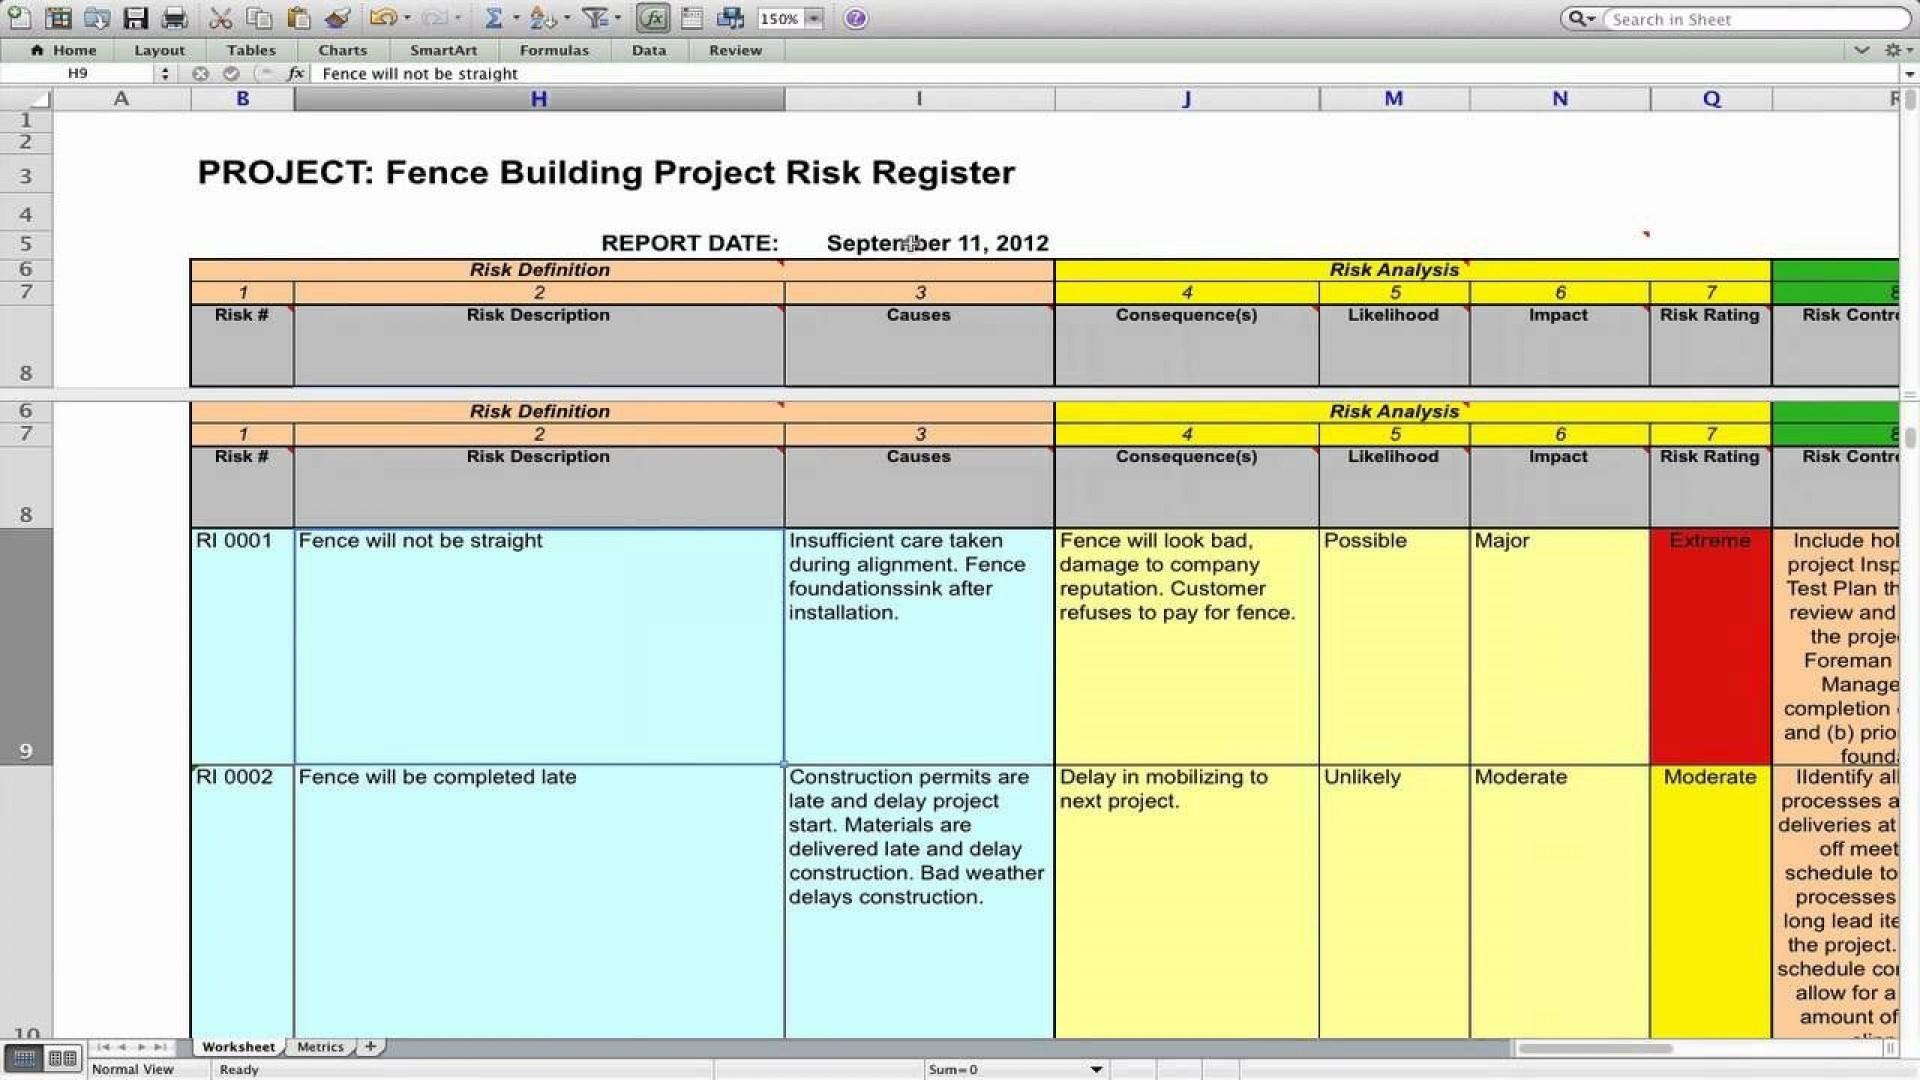 003 Surprising Project Risk Management Plan Template Excel Free Design 1920